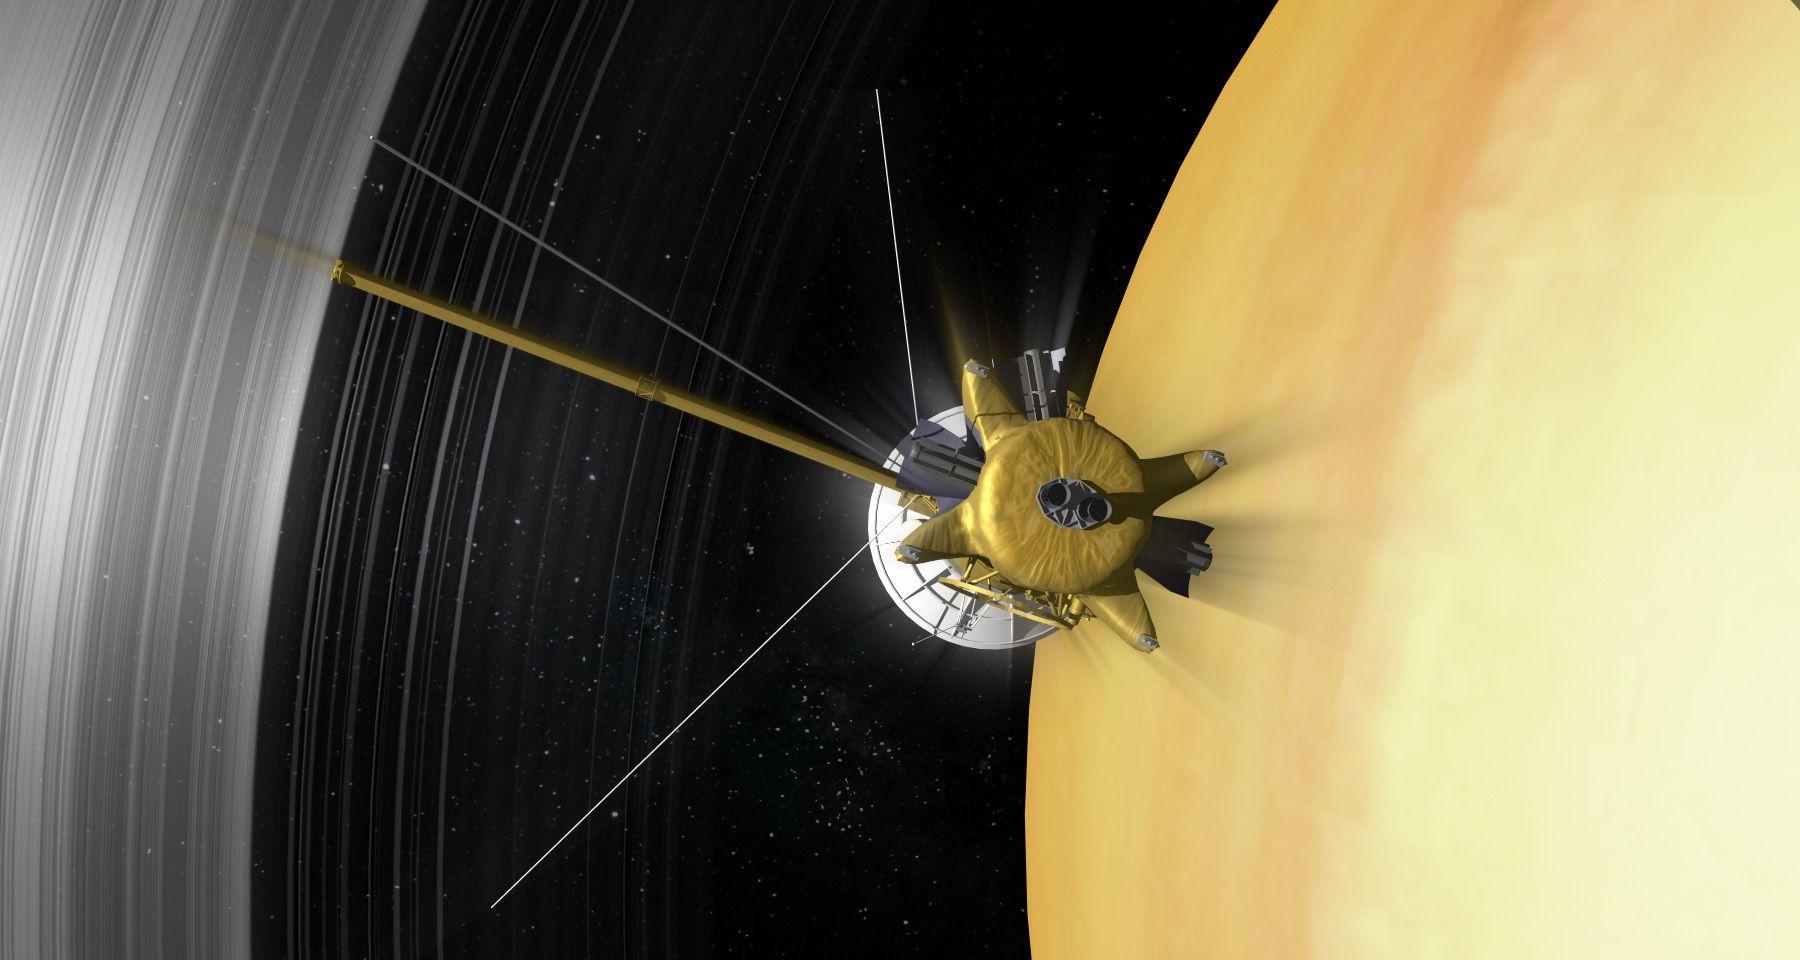 Cassini mission to saturn